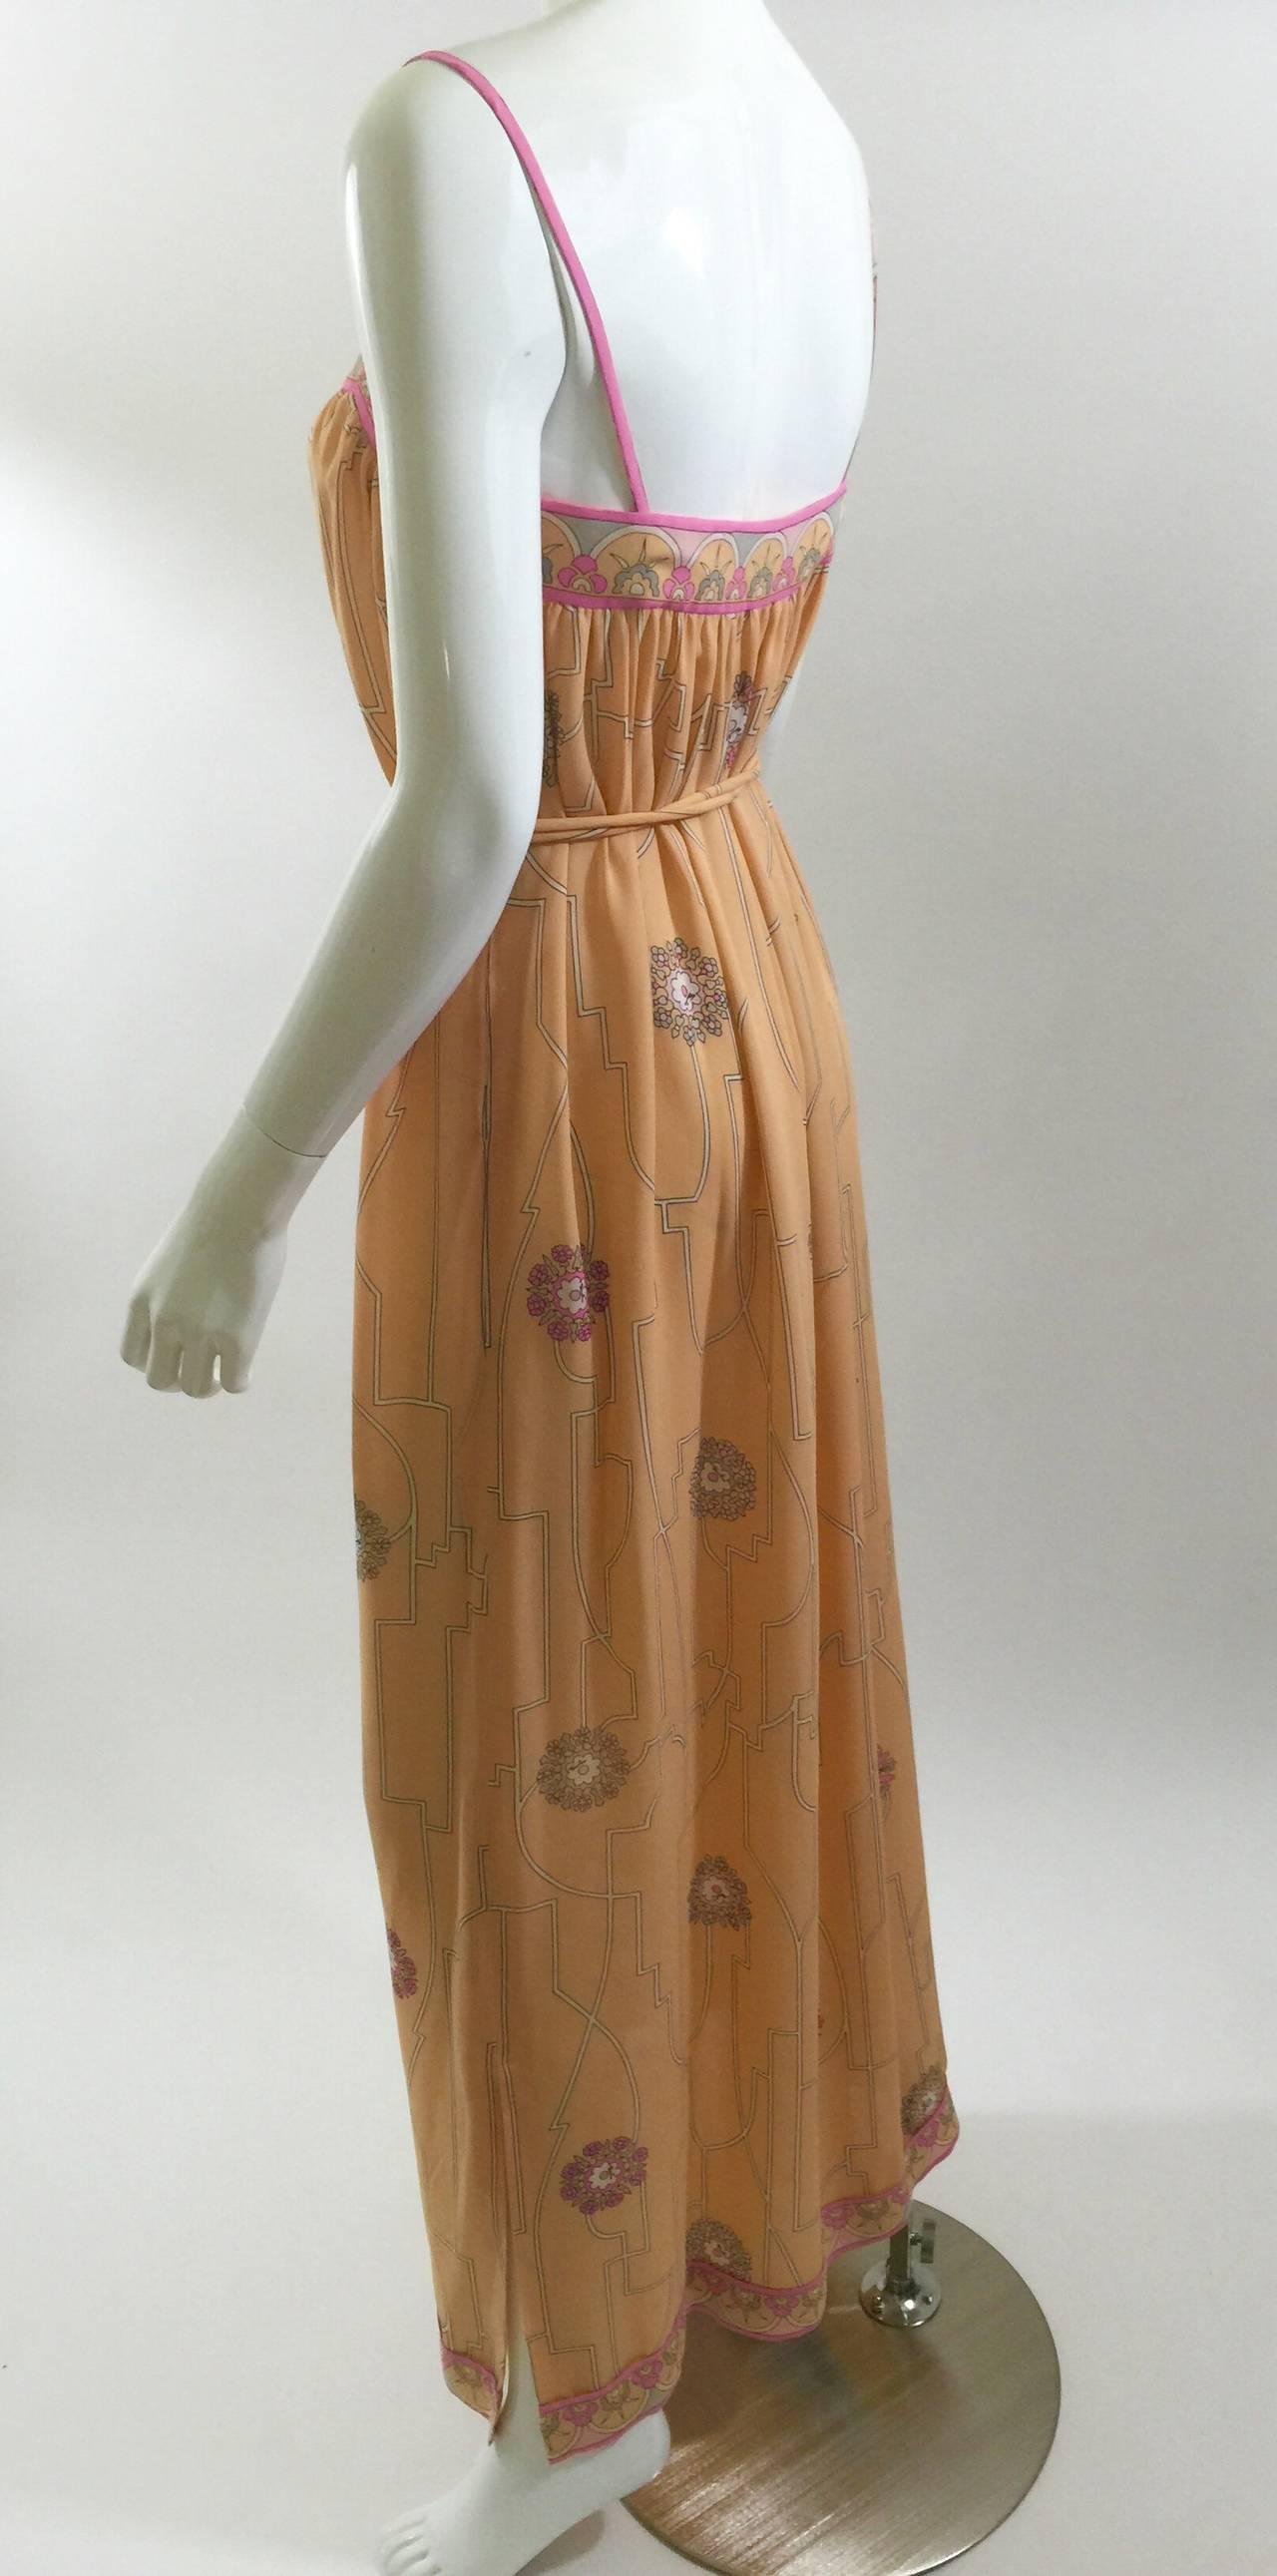 Ethereal 1960'S Emilio Pucci Vintage Silk Dress & Jacket Set Vintage w/ Tags For Sale 2